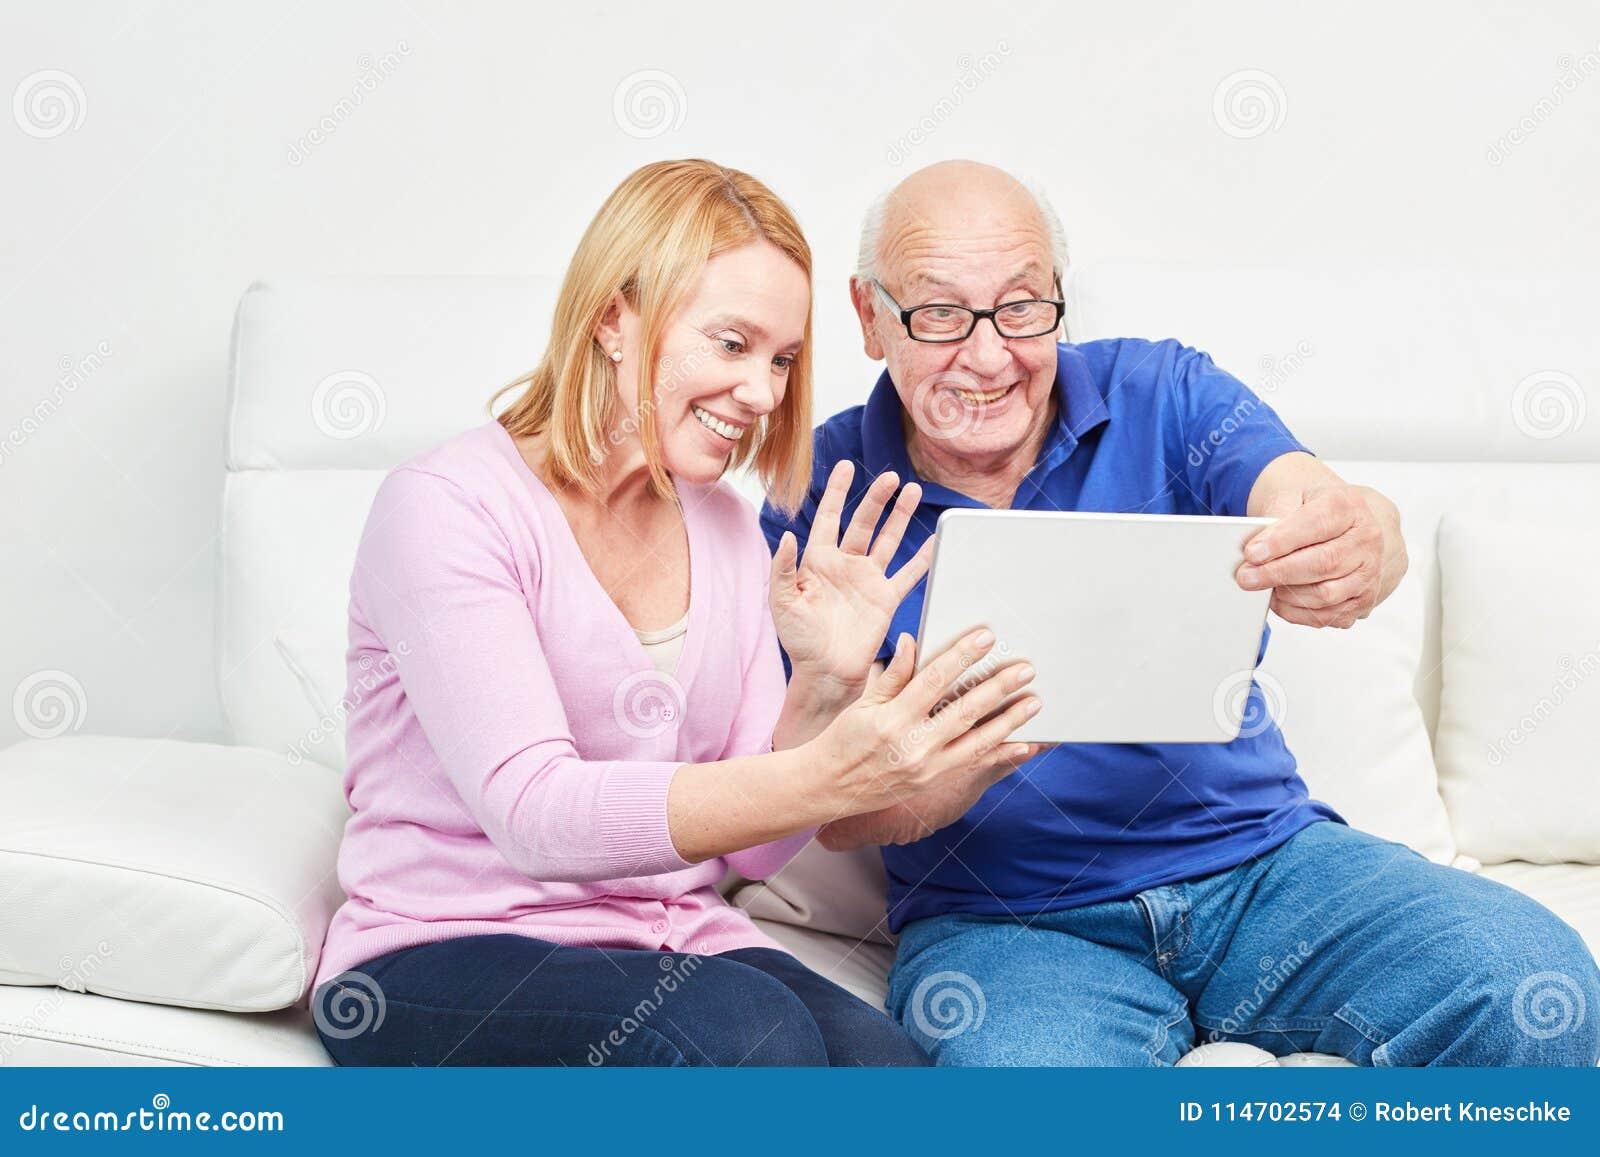 Senior citizen chat